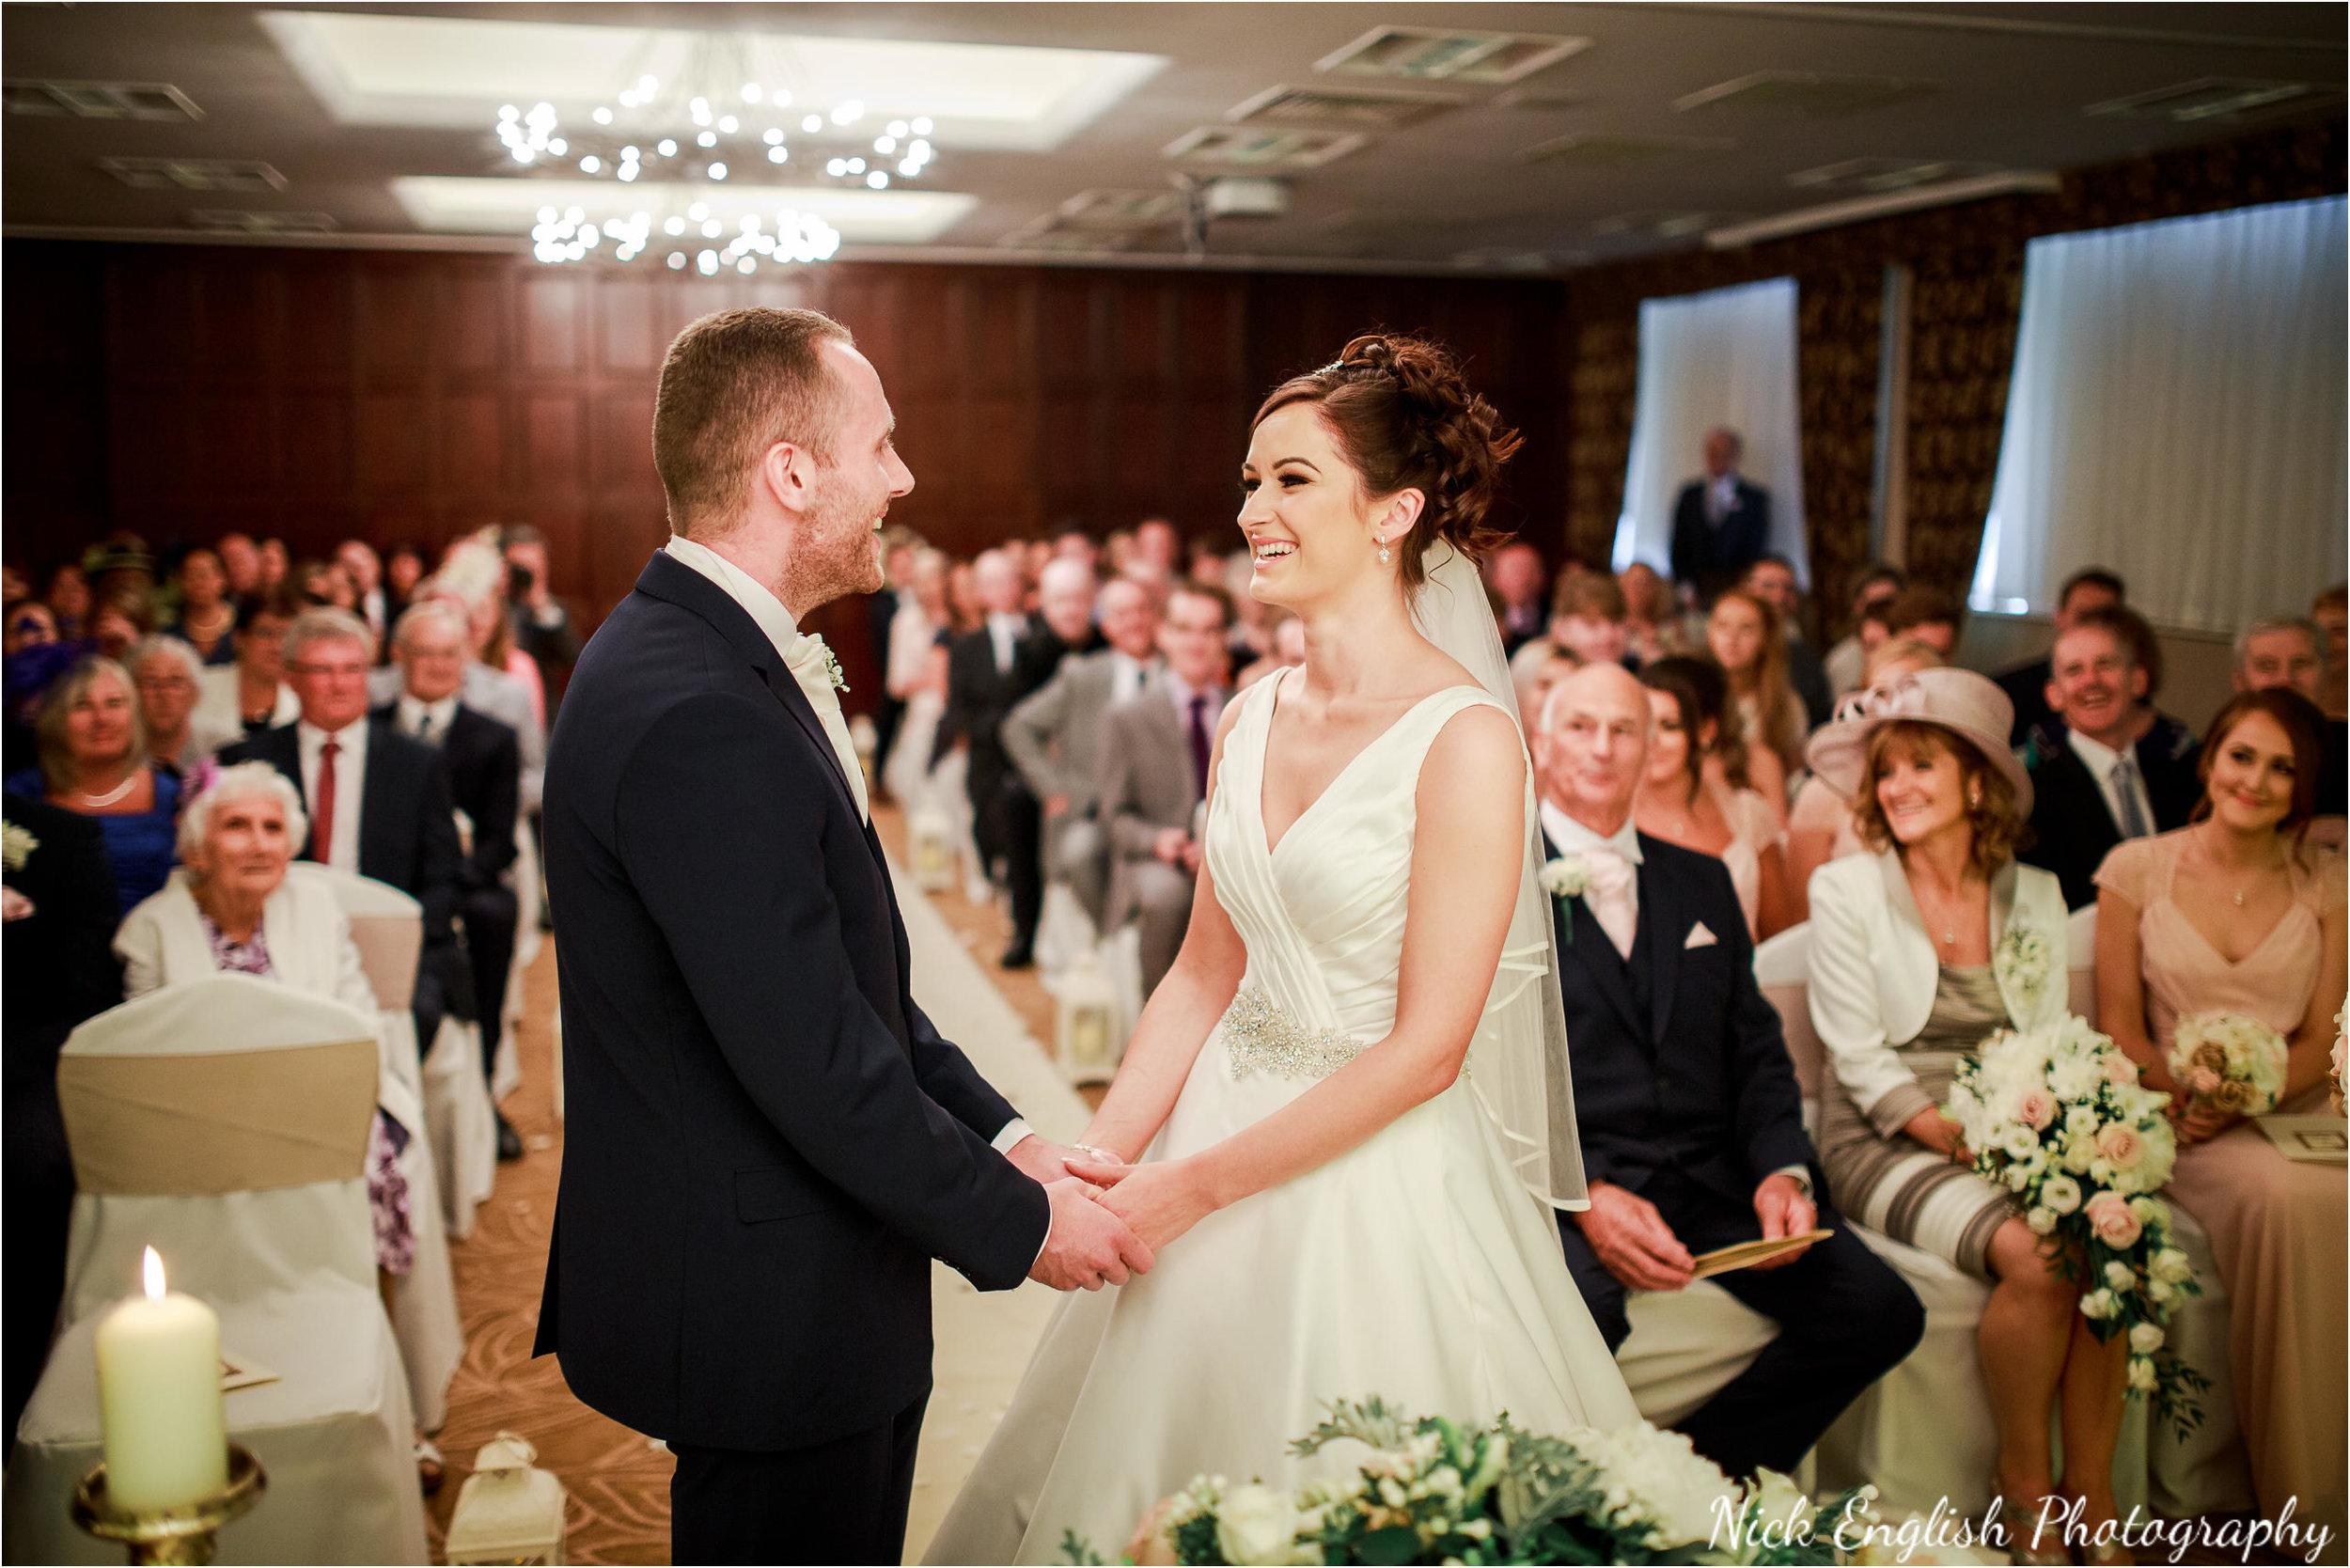 Emily David Wedding Photographs at Barton Grange Preston by Nick English Photography 68jpg.jpeg